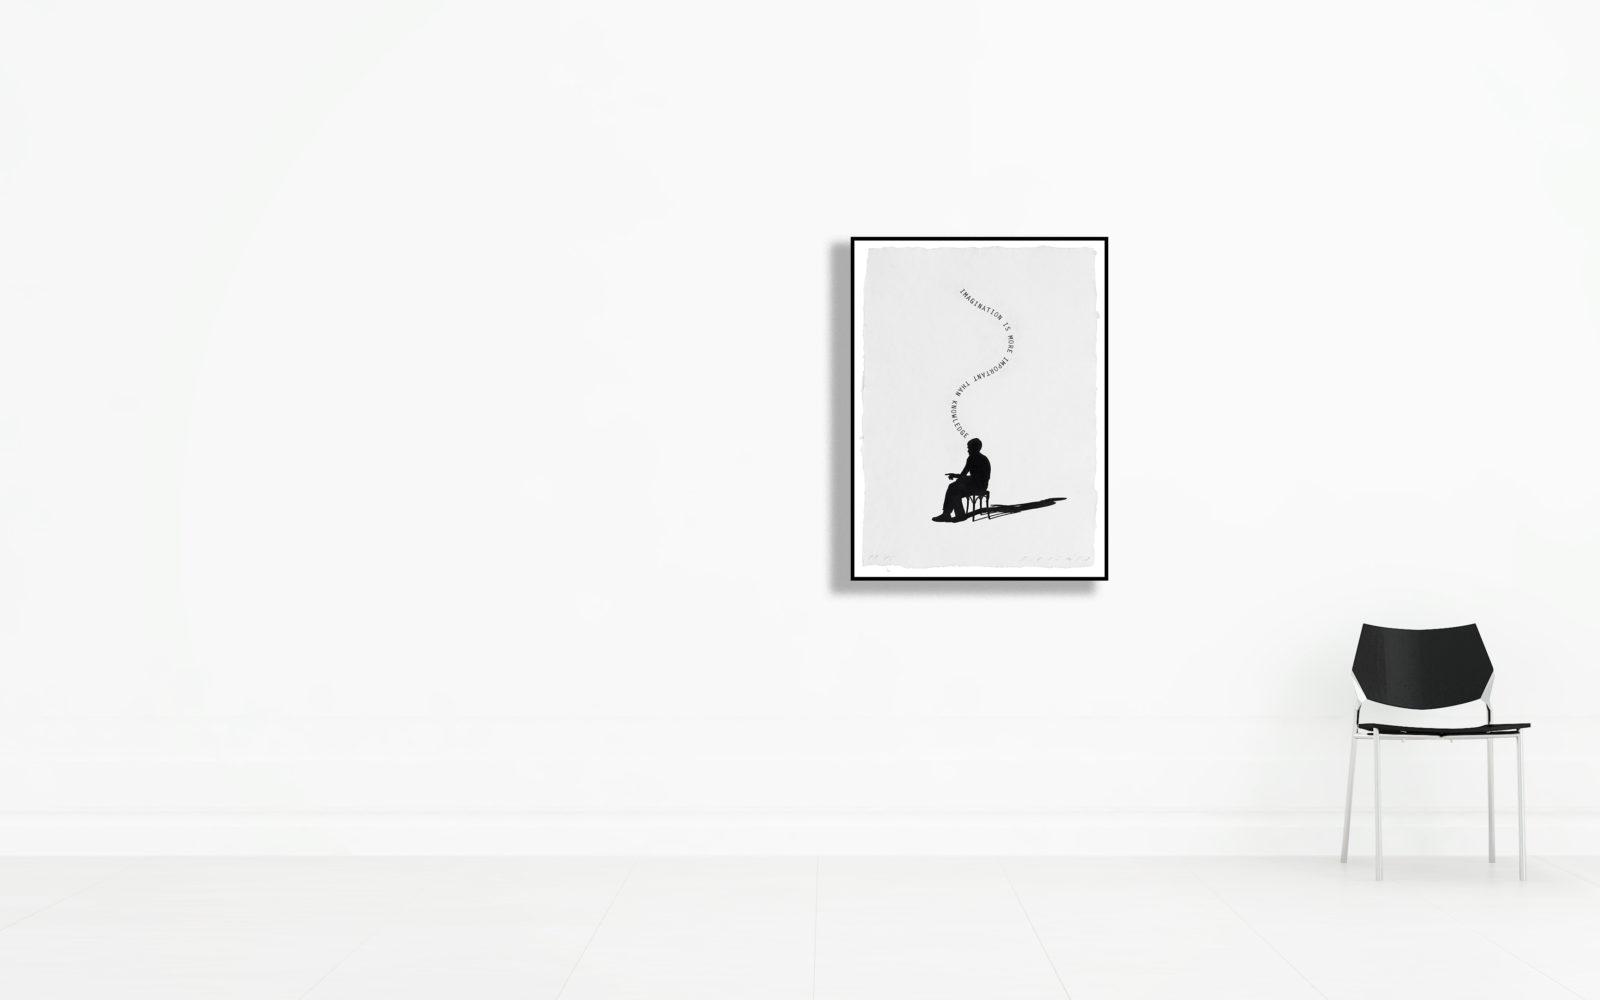 Jaume Plensa - Les silhouettes II 62 x 45 cm